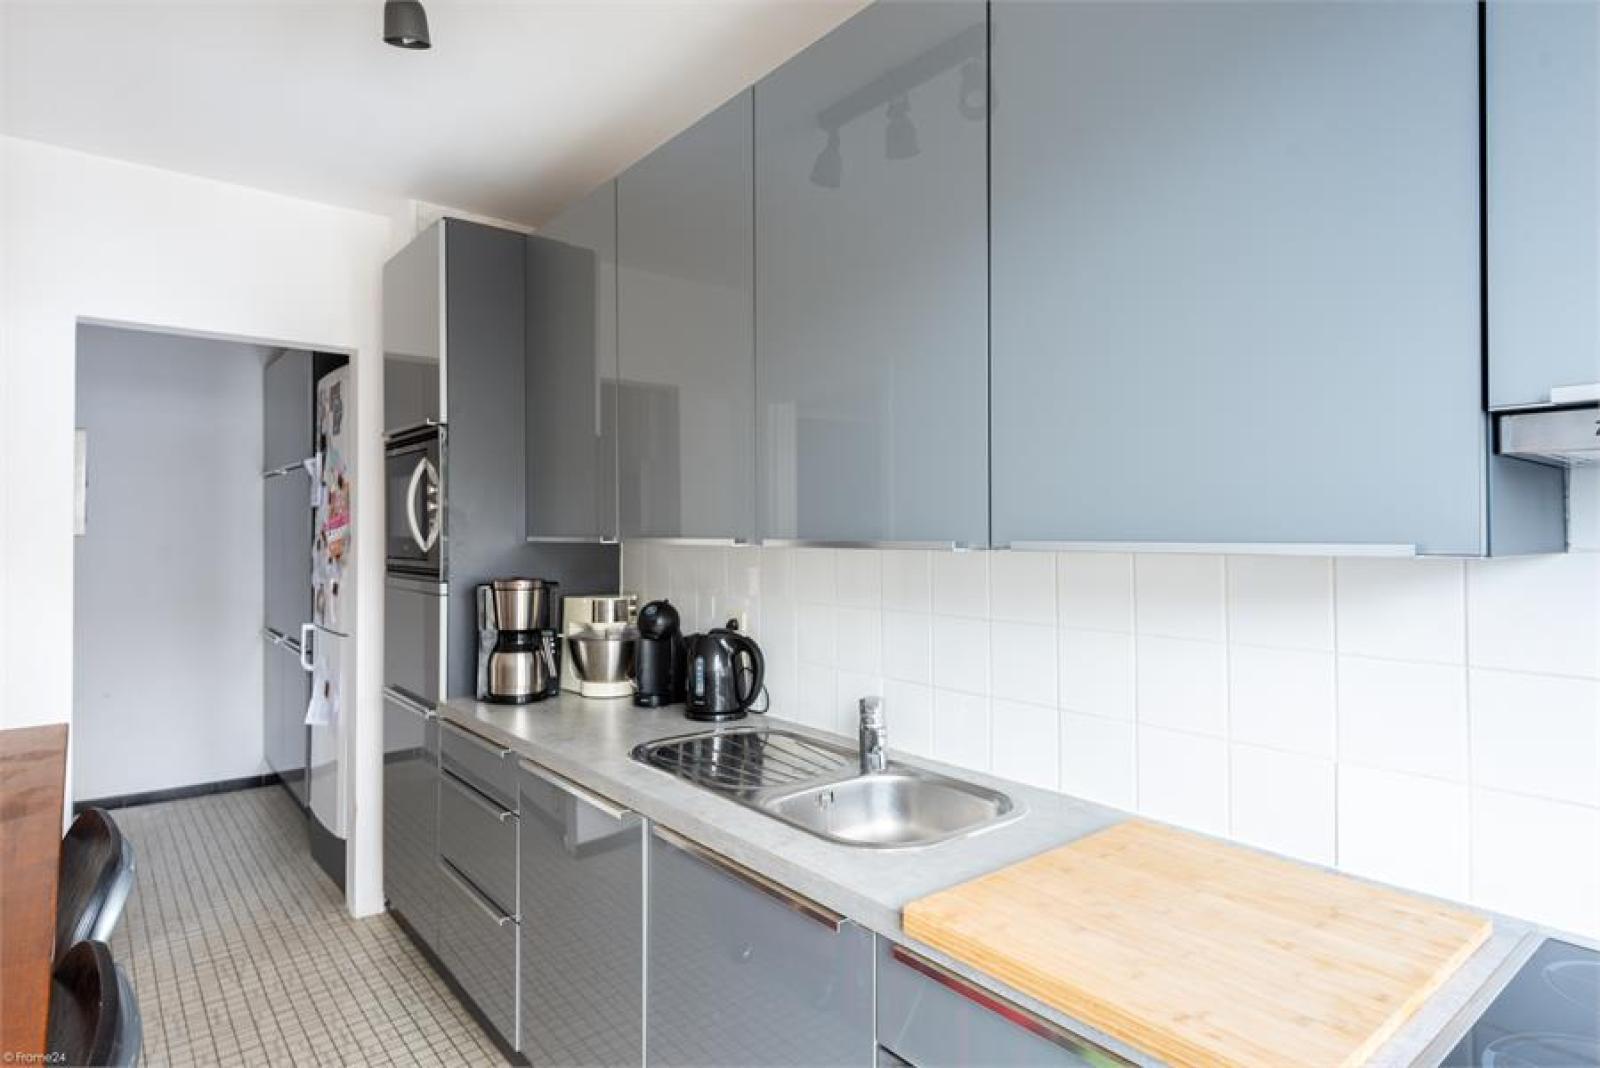 Instapklaar appartement (77 m²) met twee slaapkamers op centrale ligging te Deurne! afbeelding 8